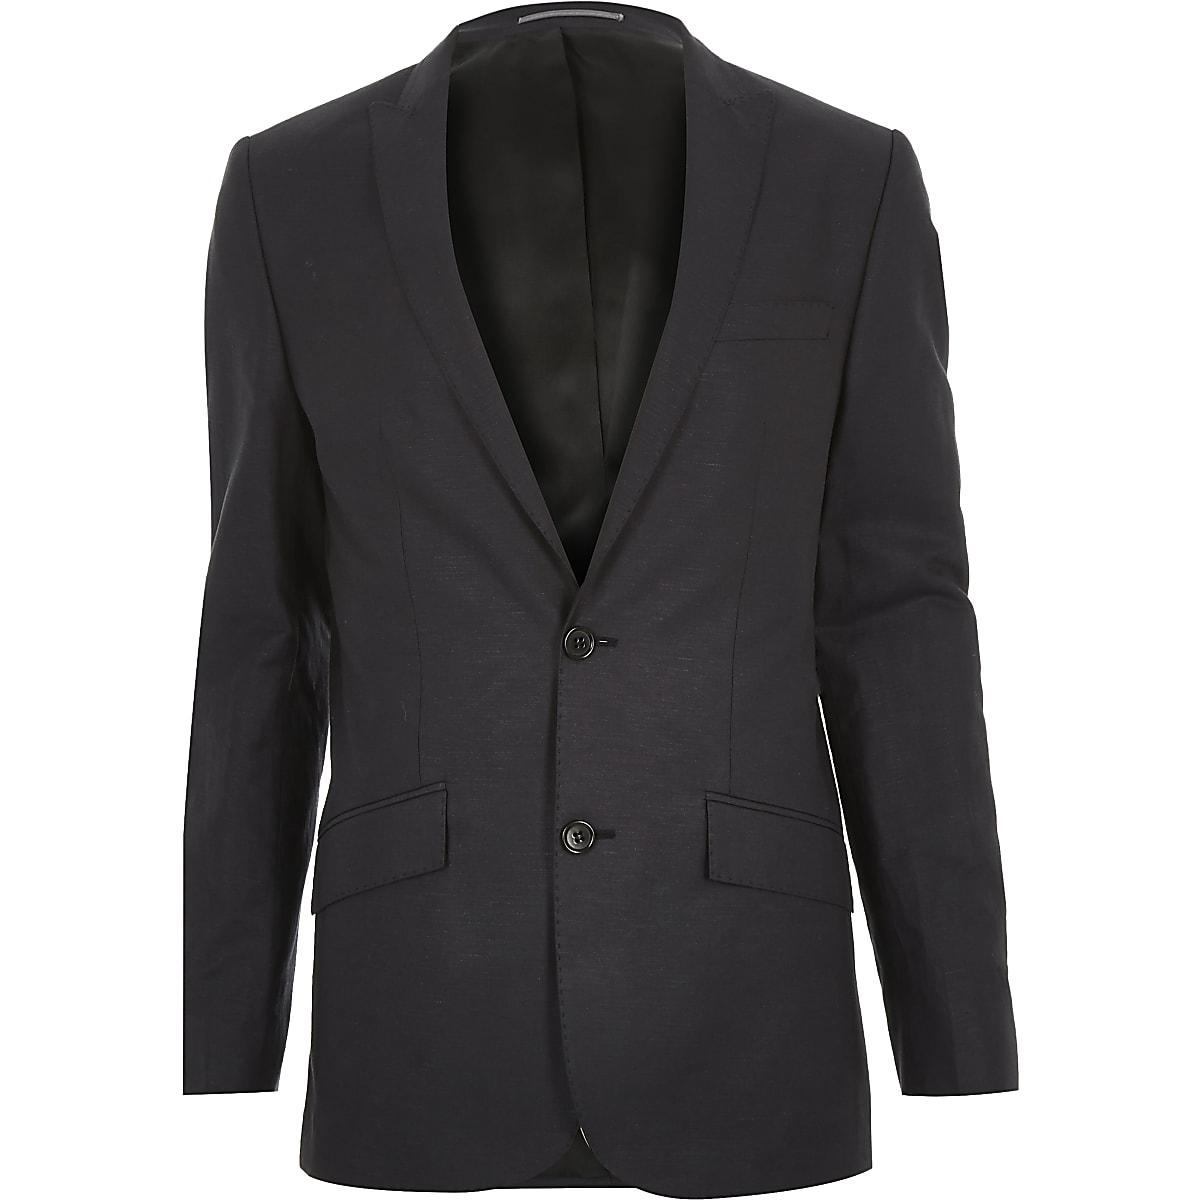 Navy linen-blend skinny suit jacket